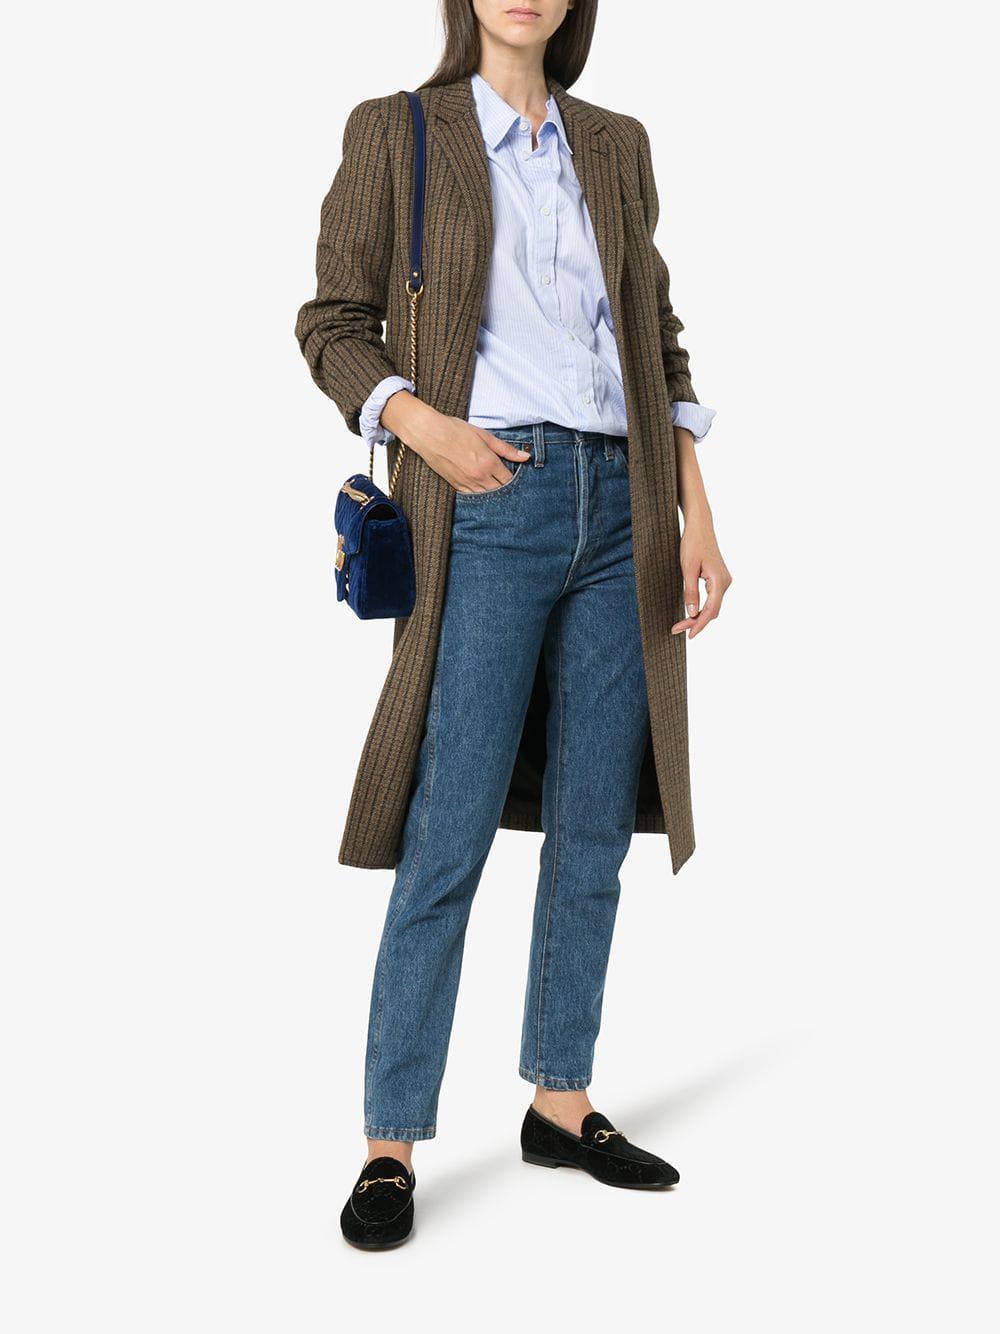 94146067c2d Lyst - Gucci Jordaan GG Velvet Loafers in Black - Save 25%